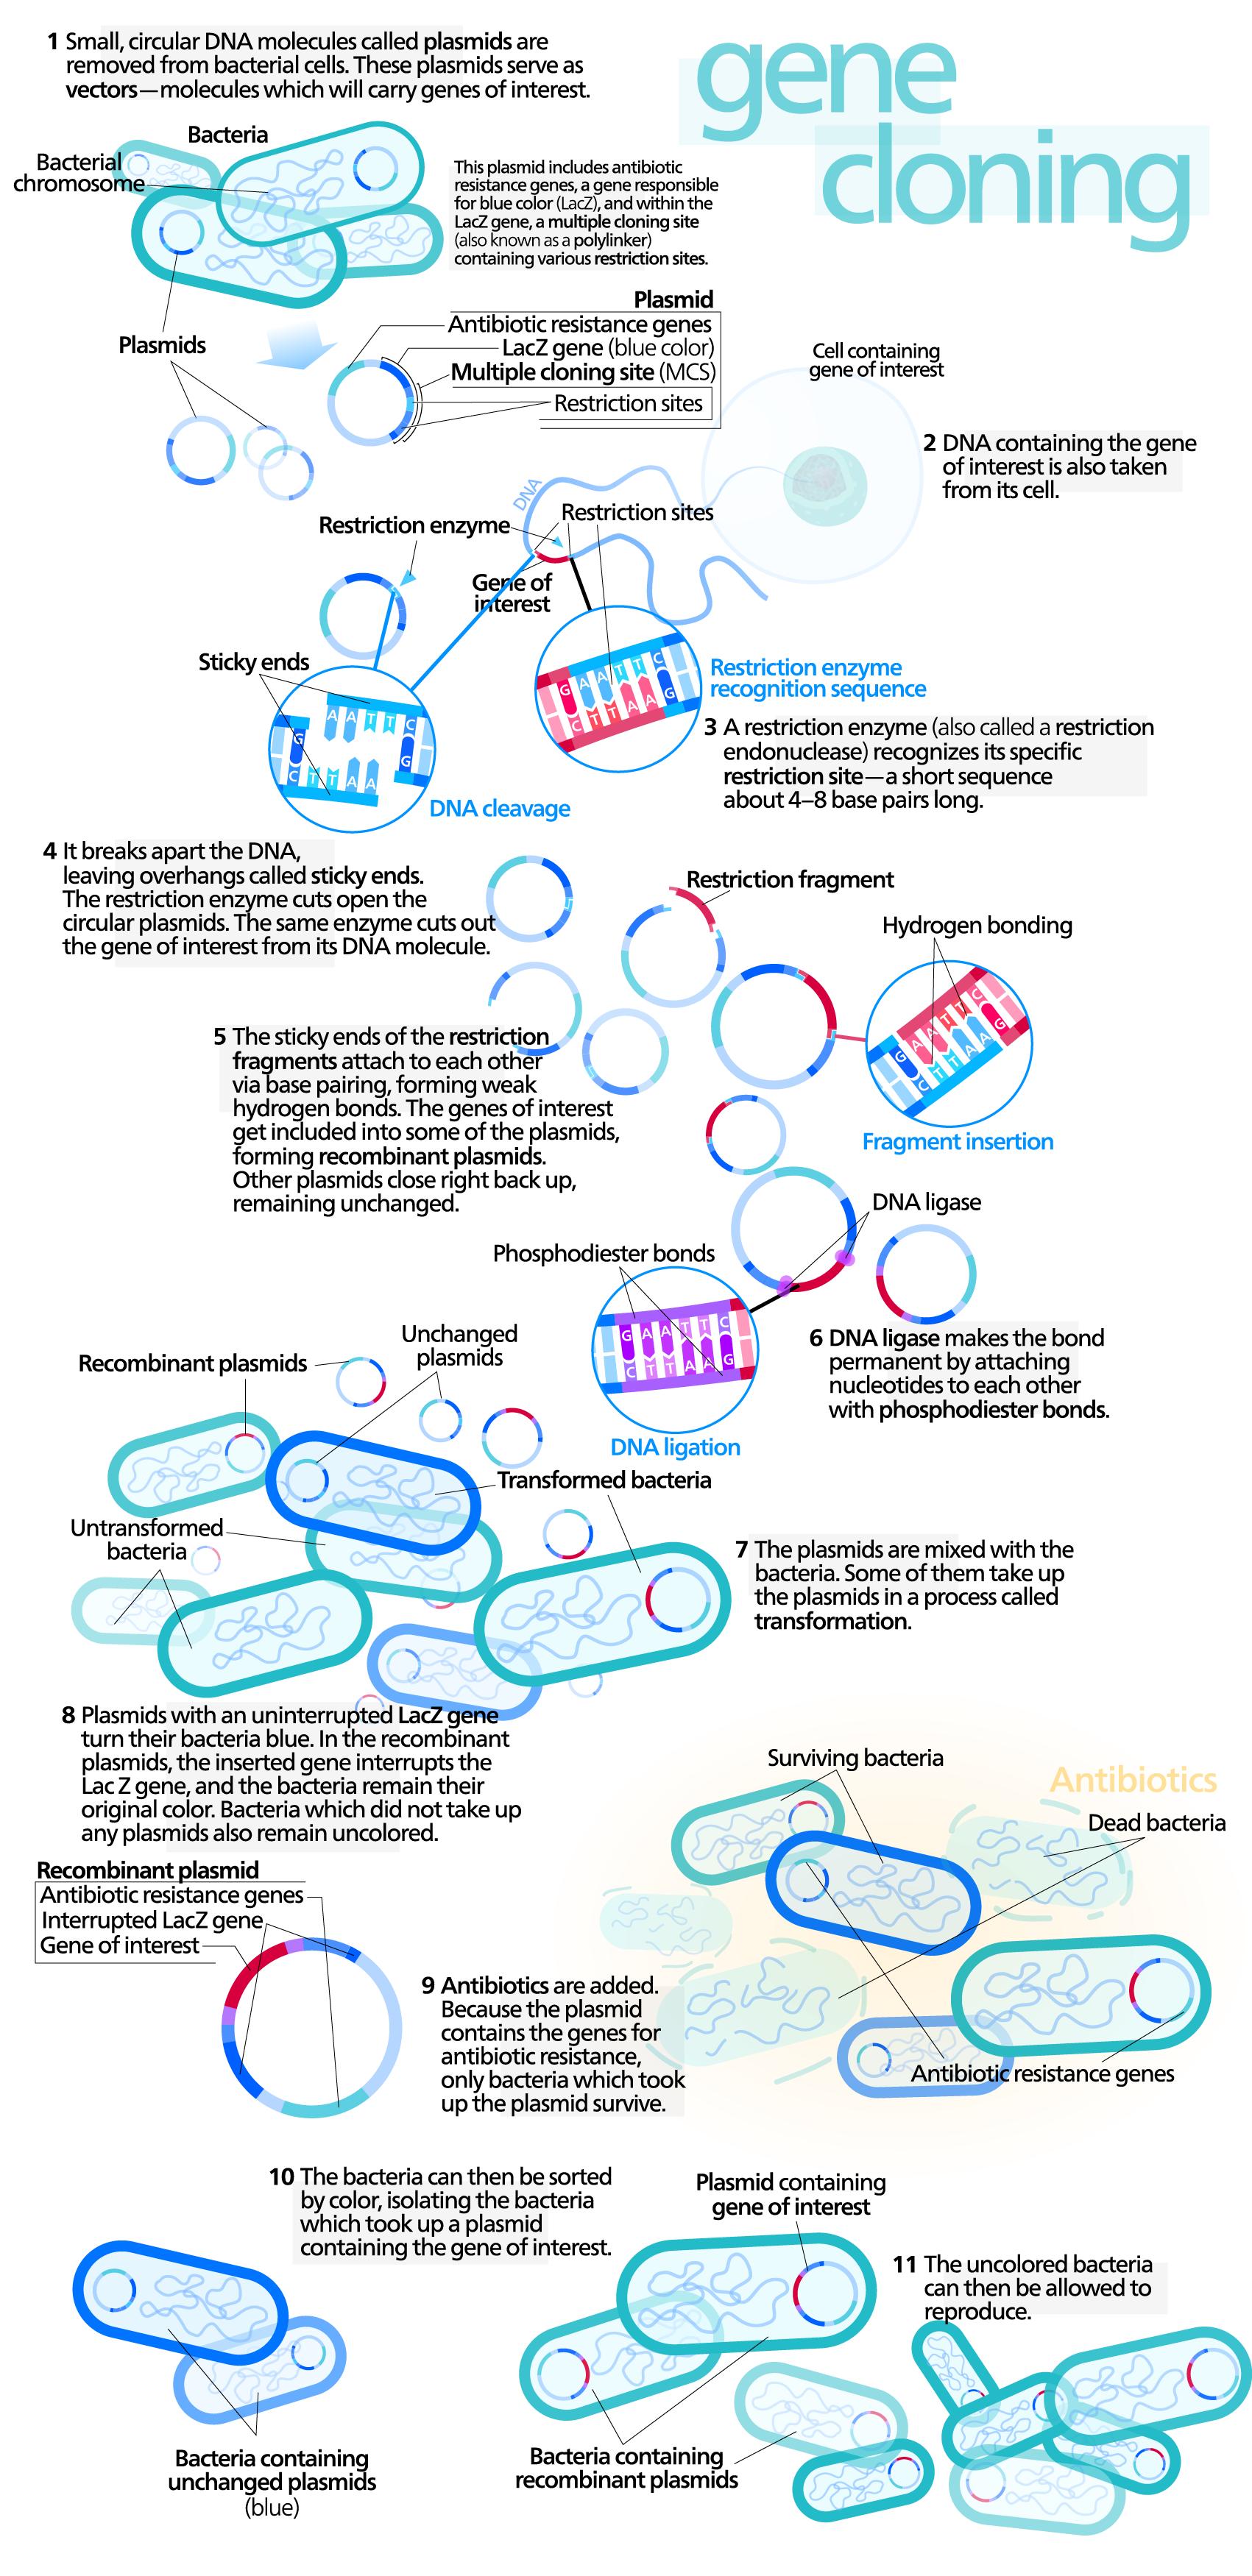 Cloning Process Diagram | anatomy chimie | Pinterest | Diagram ...